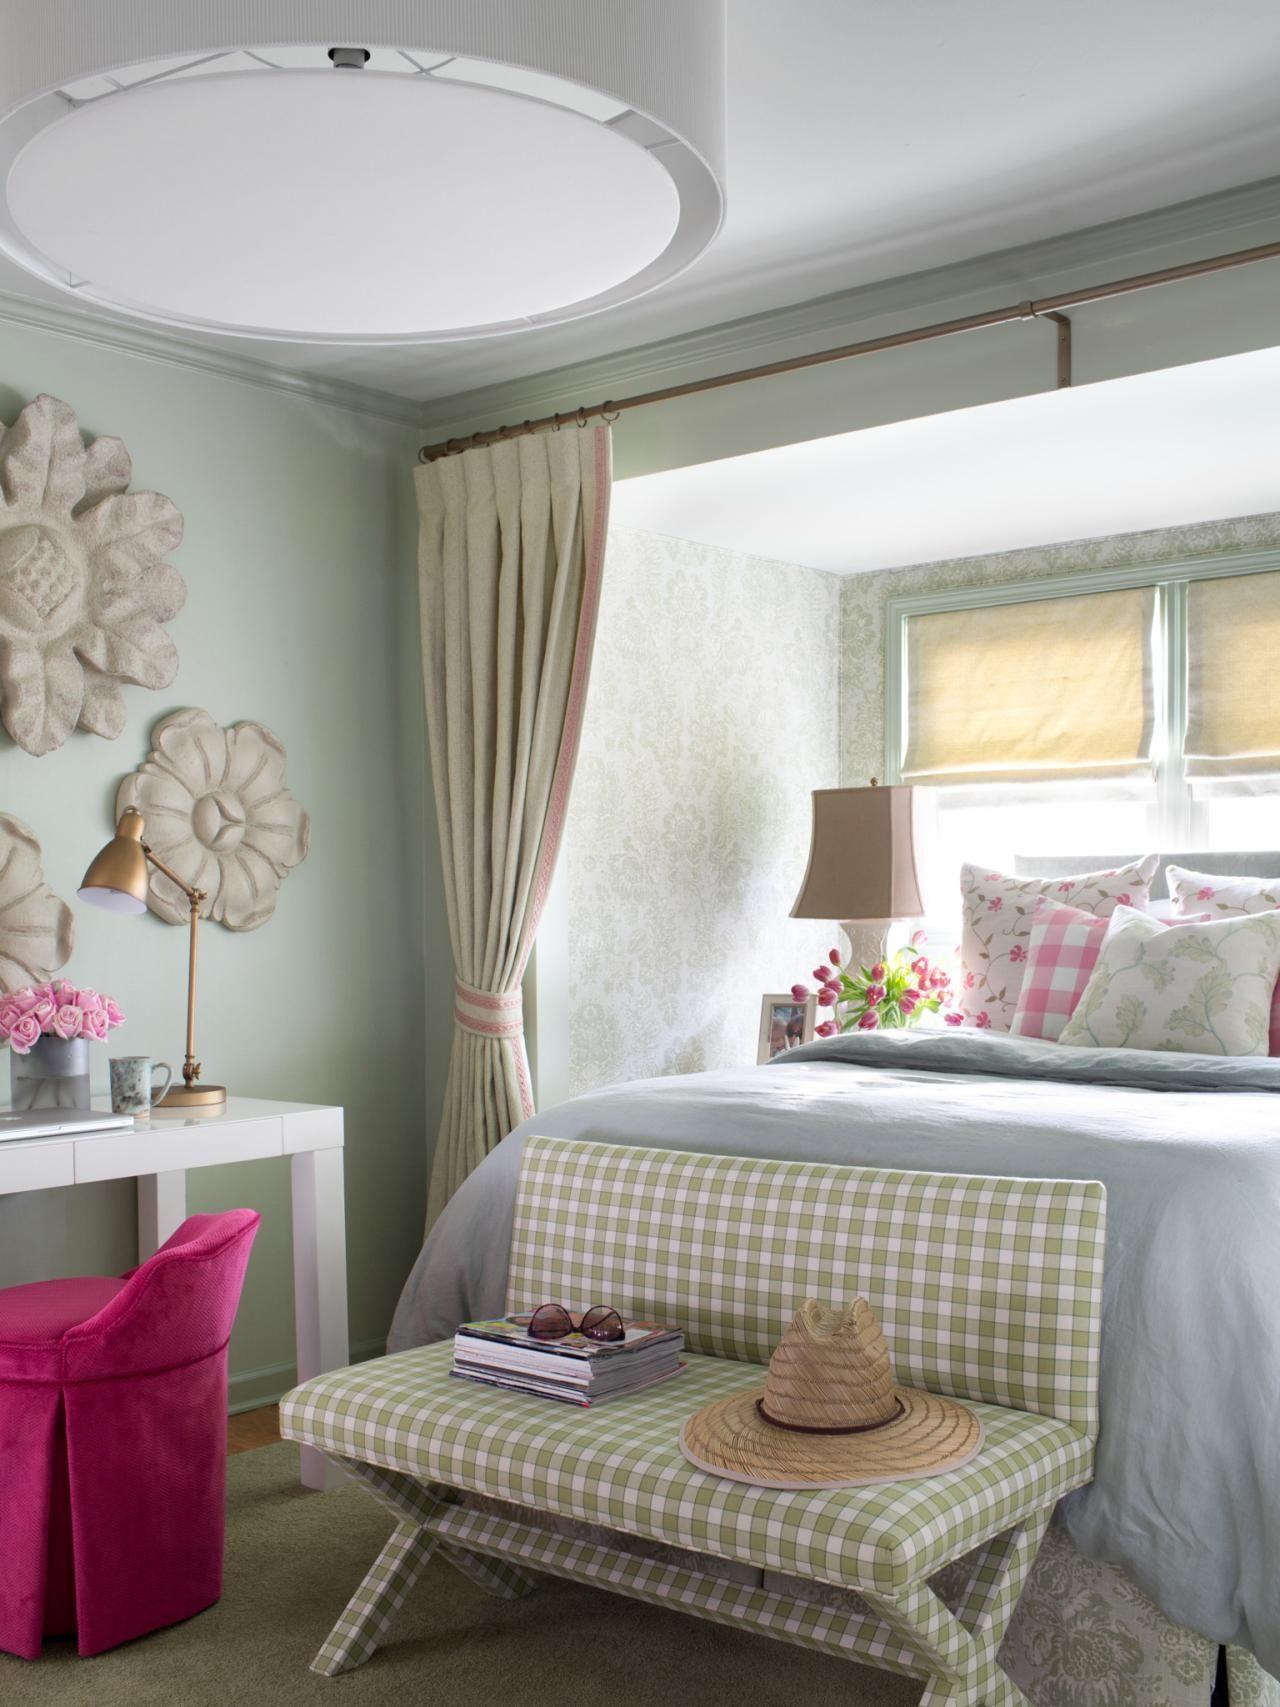 15 Beautiful Cottage Bedroom Design Ideas - Decoration Love Modern